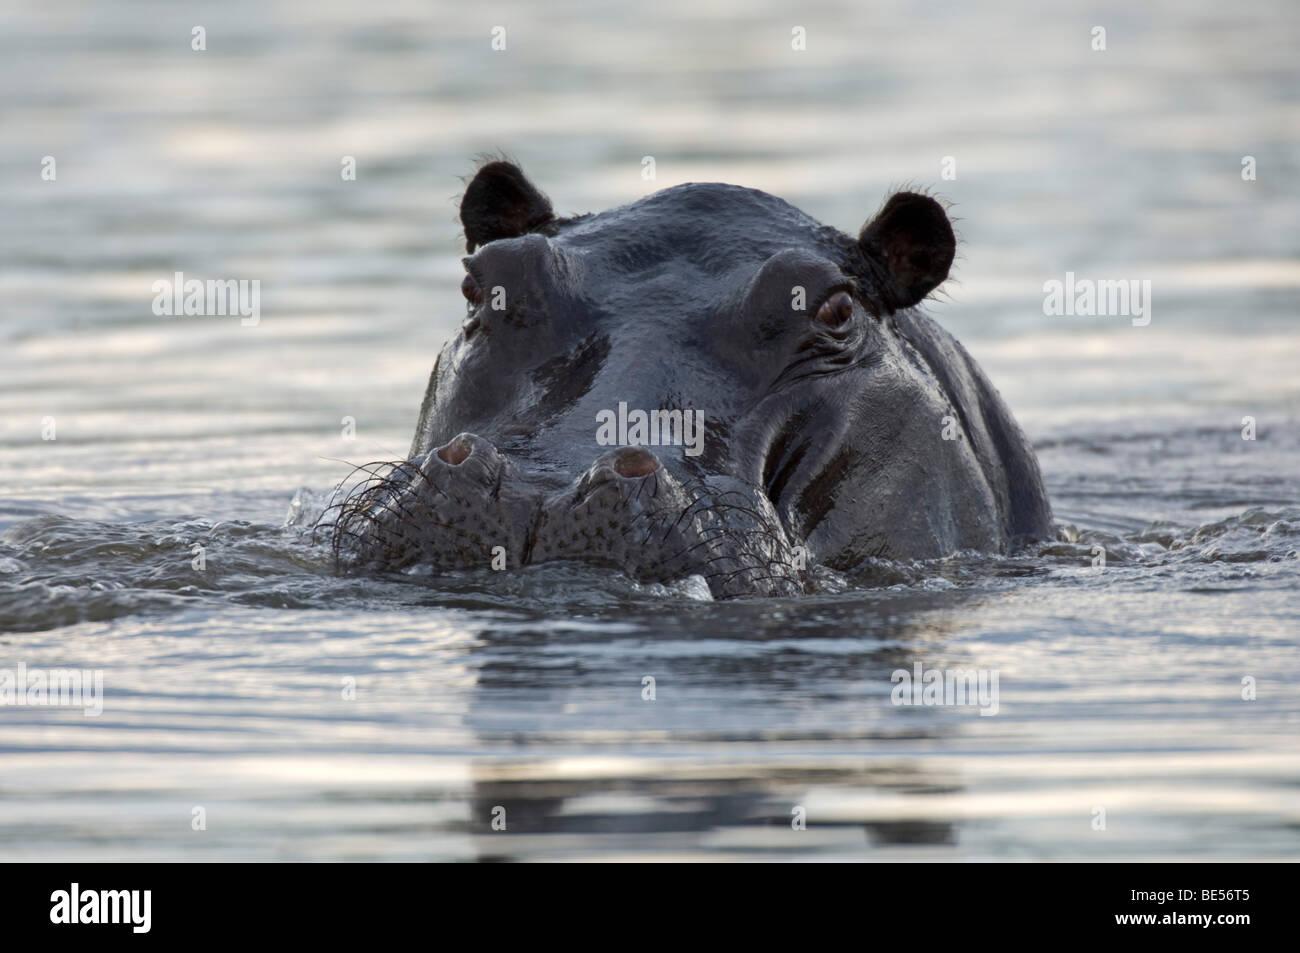 Hippopotamus (Hippopotamus amphibius), Okavango Delta, Botswana - Stock Image